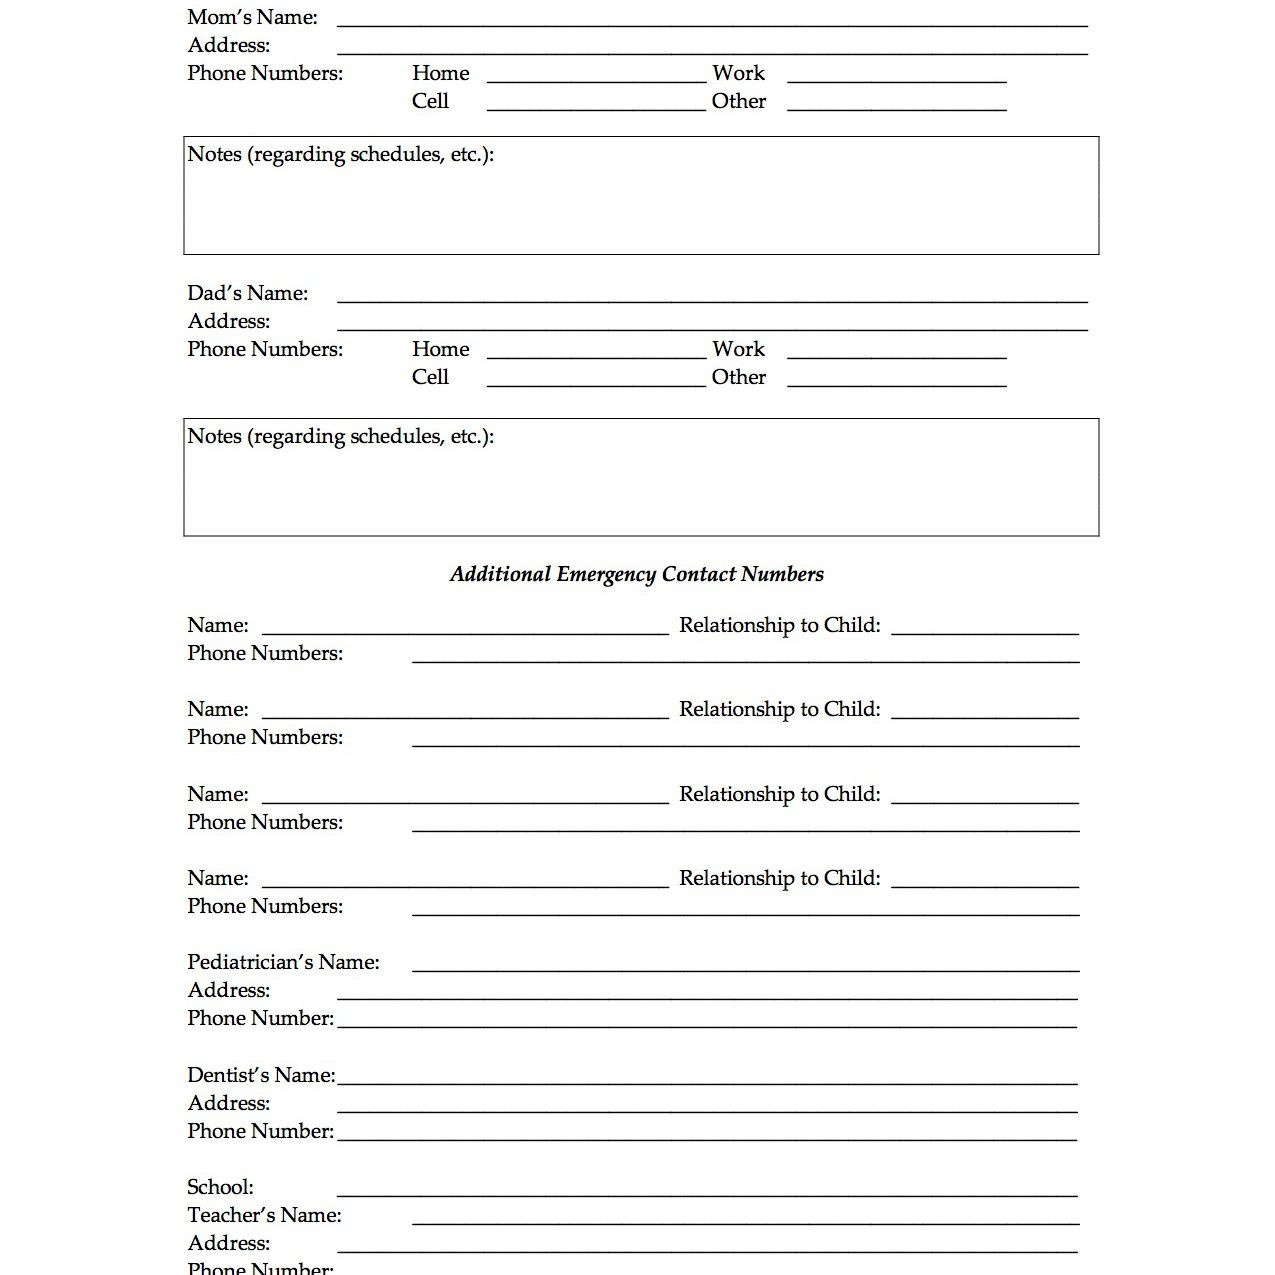 17 Beautiful Free Printable Adoption Papers | Papersample - Free Printable Adoption Papers